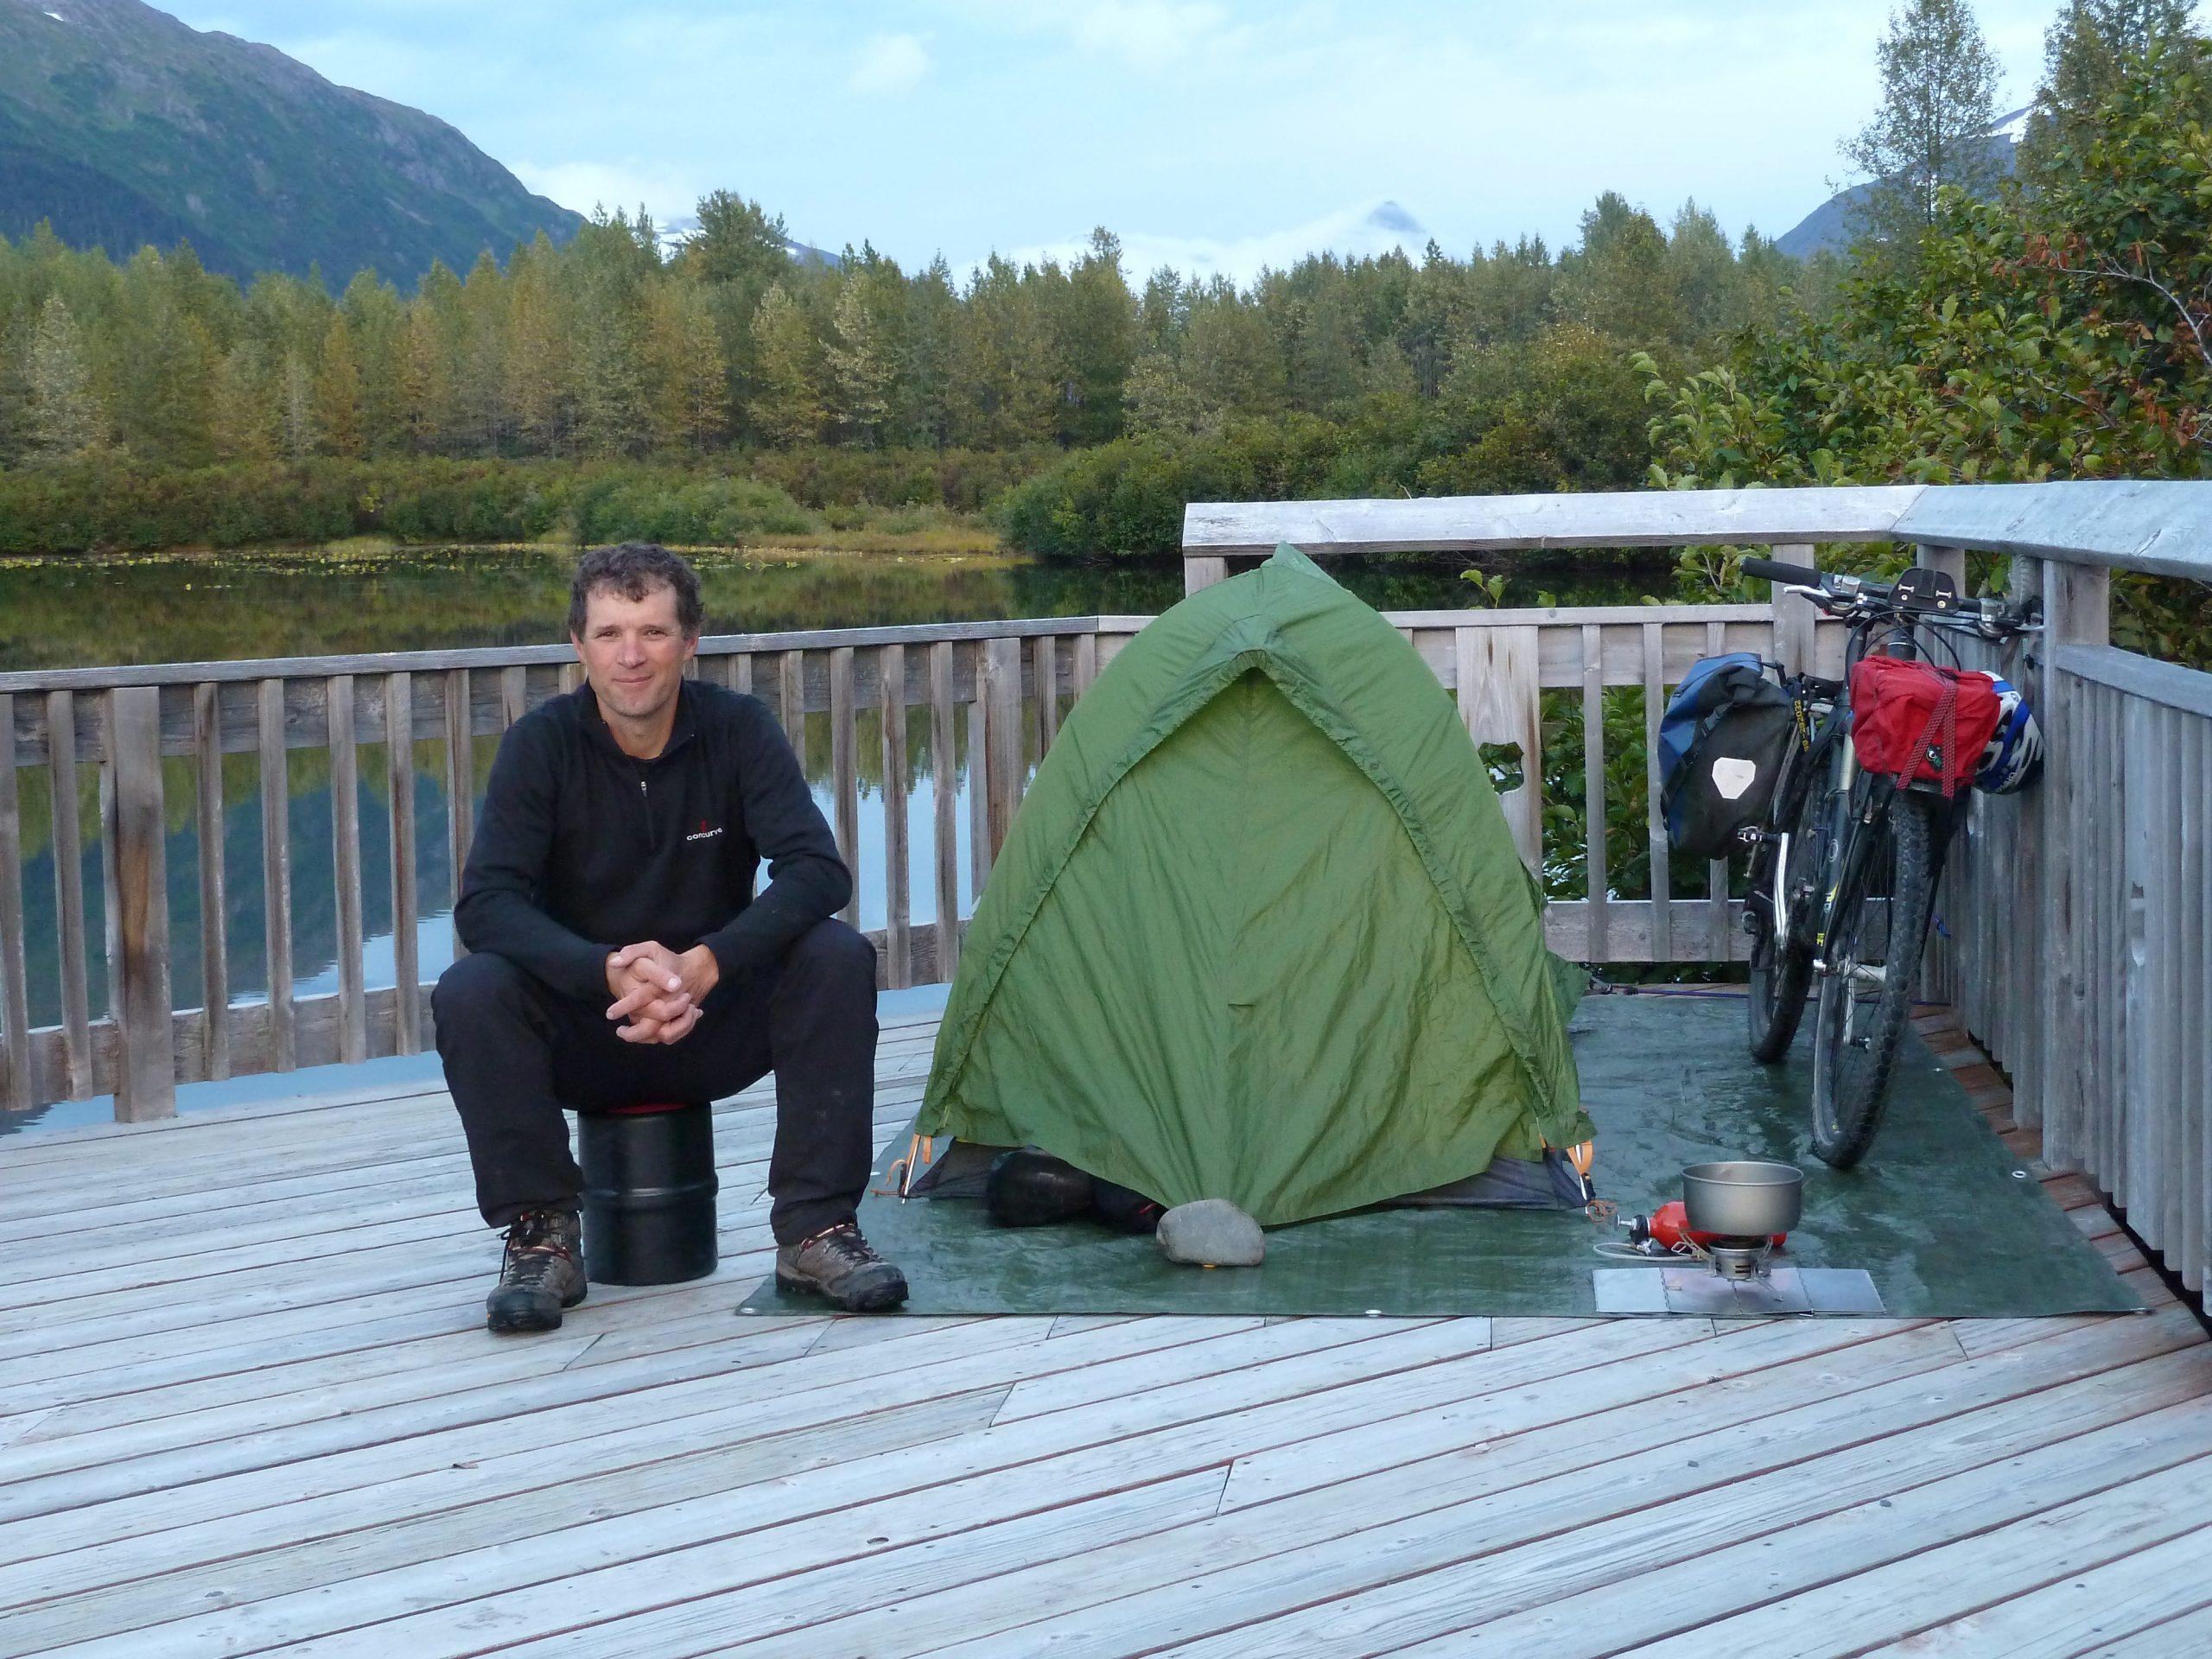 Radreise Alaska 2010 - Zeltplatz an der Portage Glacier Road